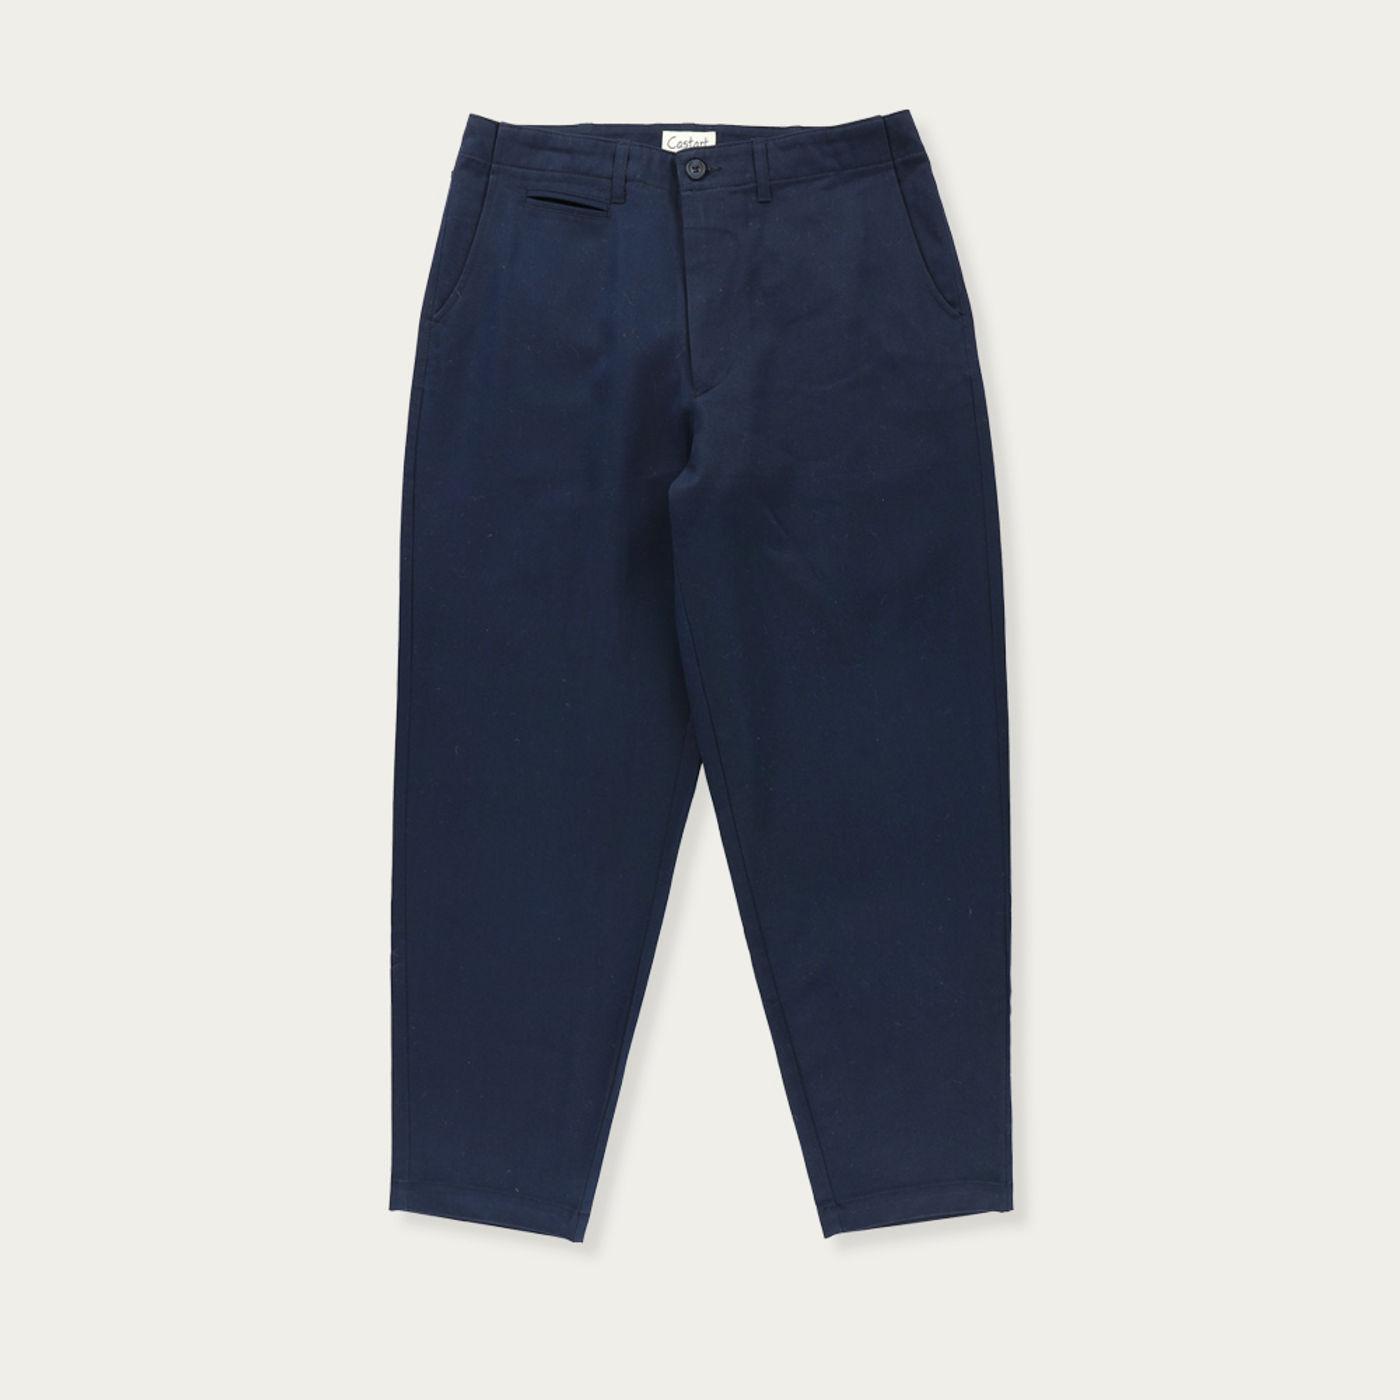 Navy Blue Beachspider Cotton Trouser   Bombinate